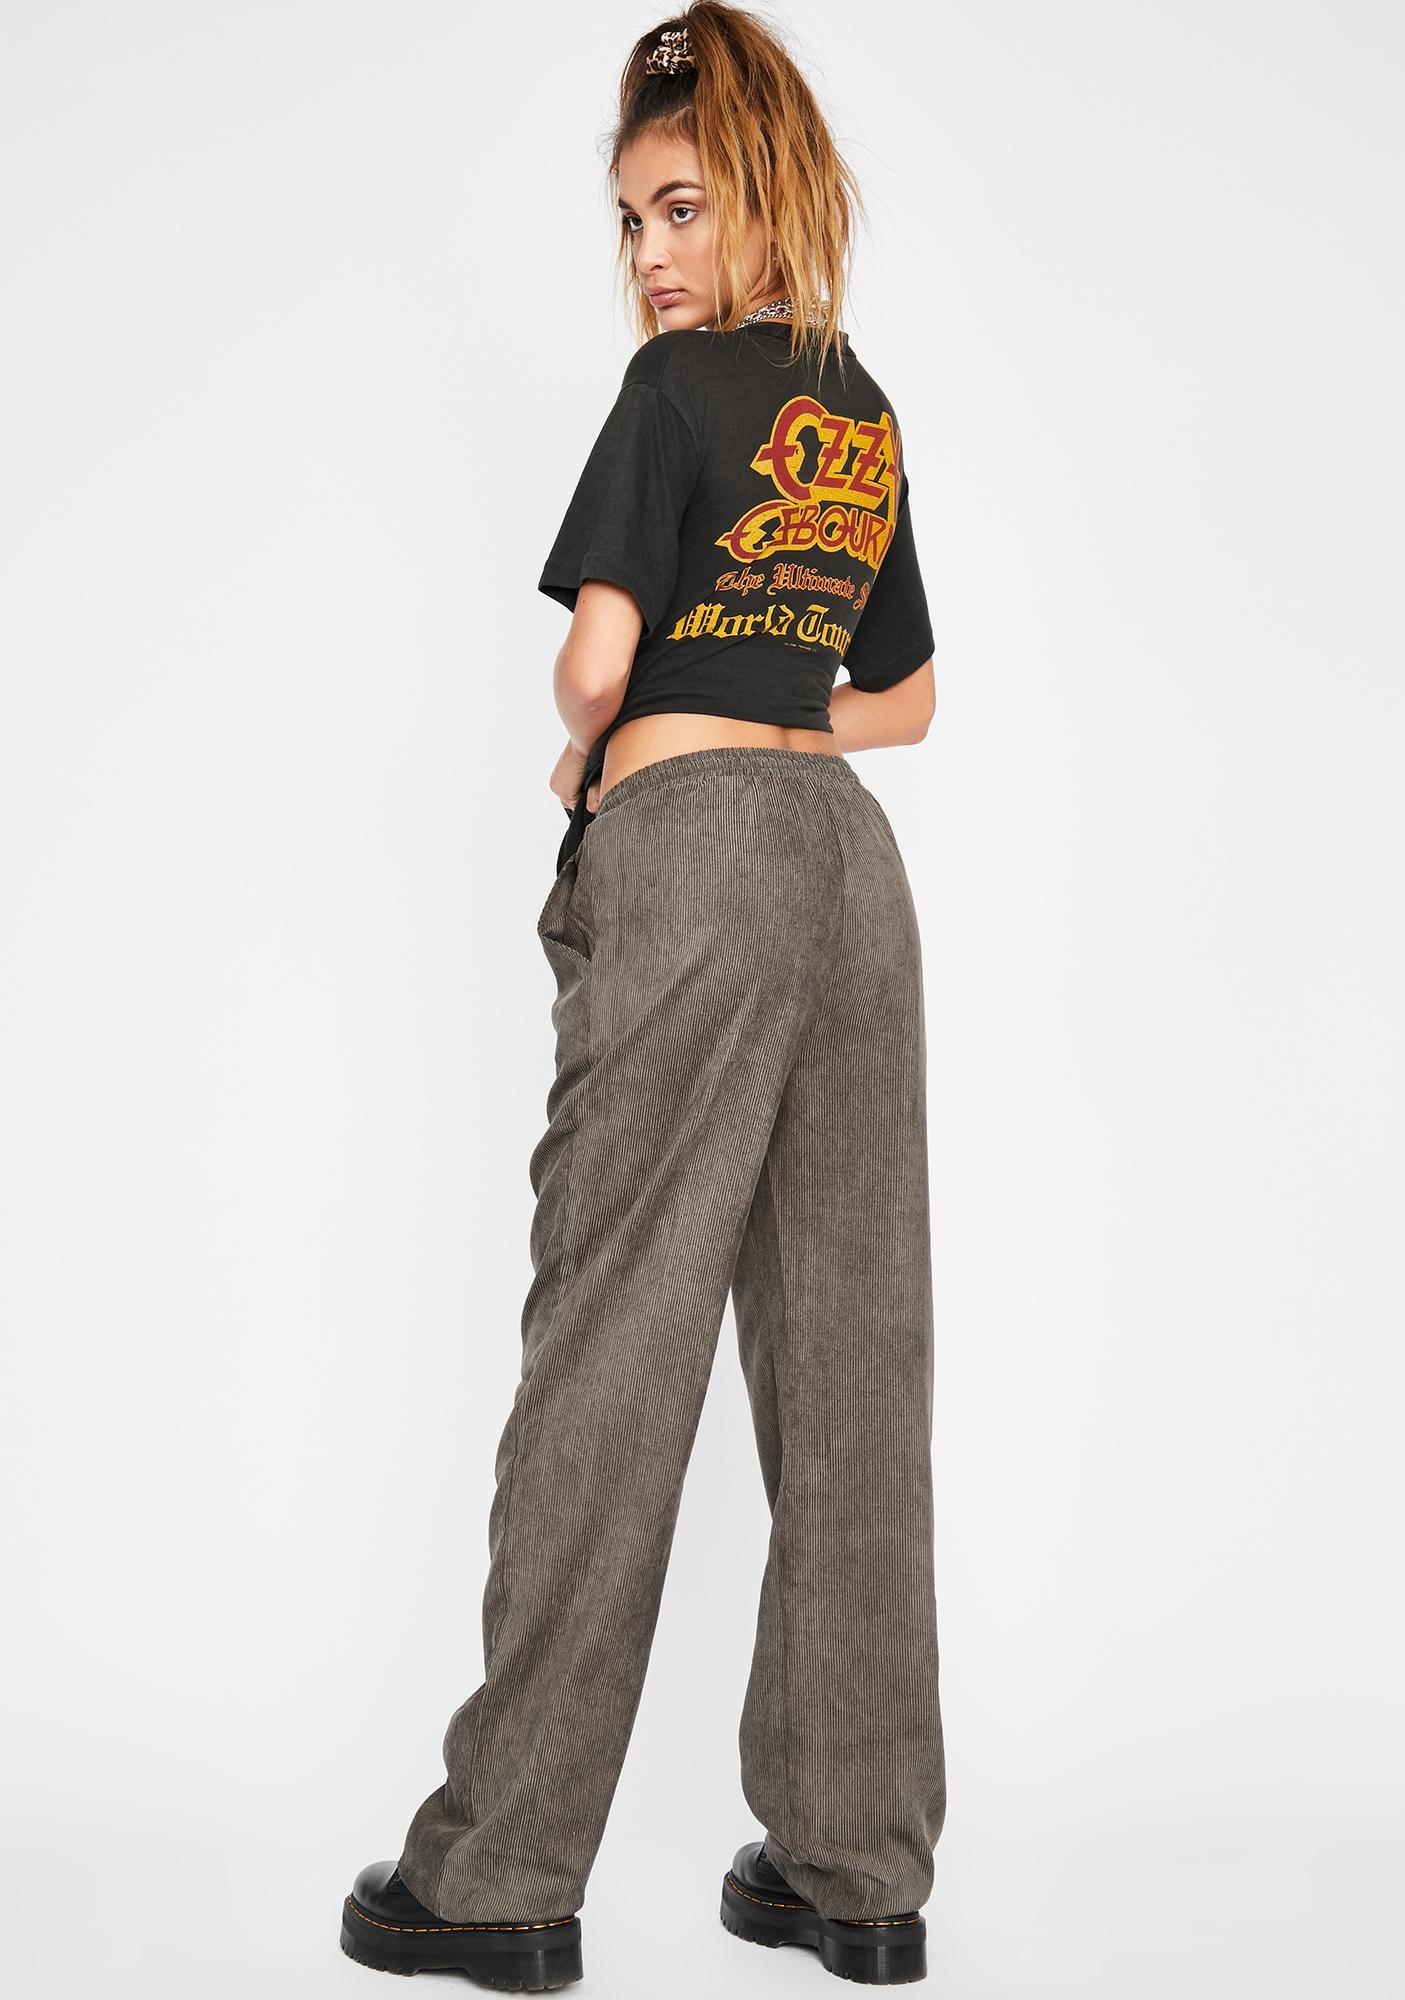 Dank Got The Hookup Corduroy Pants